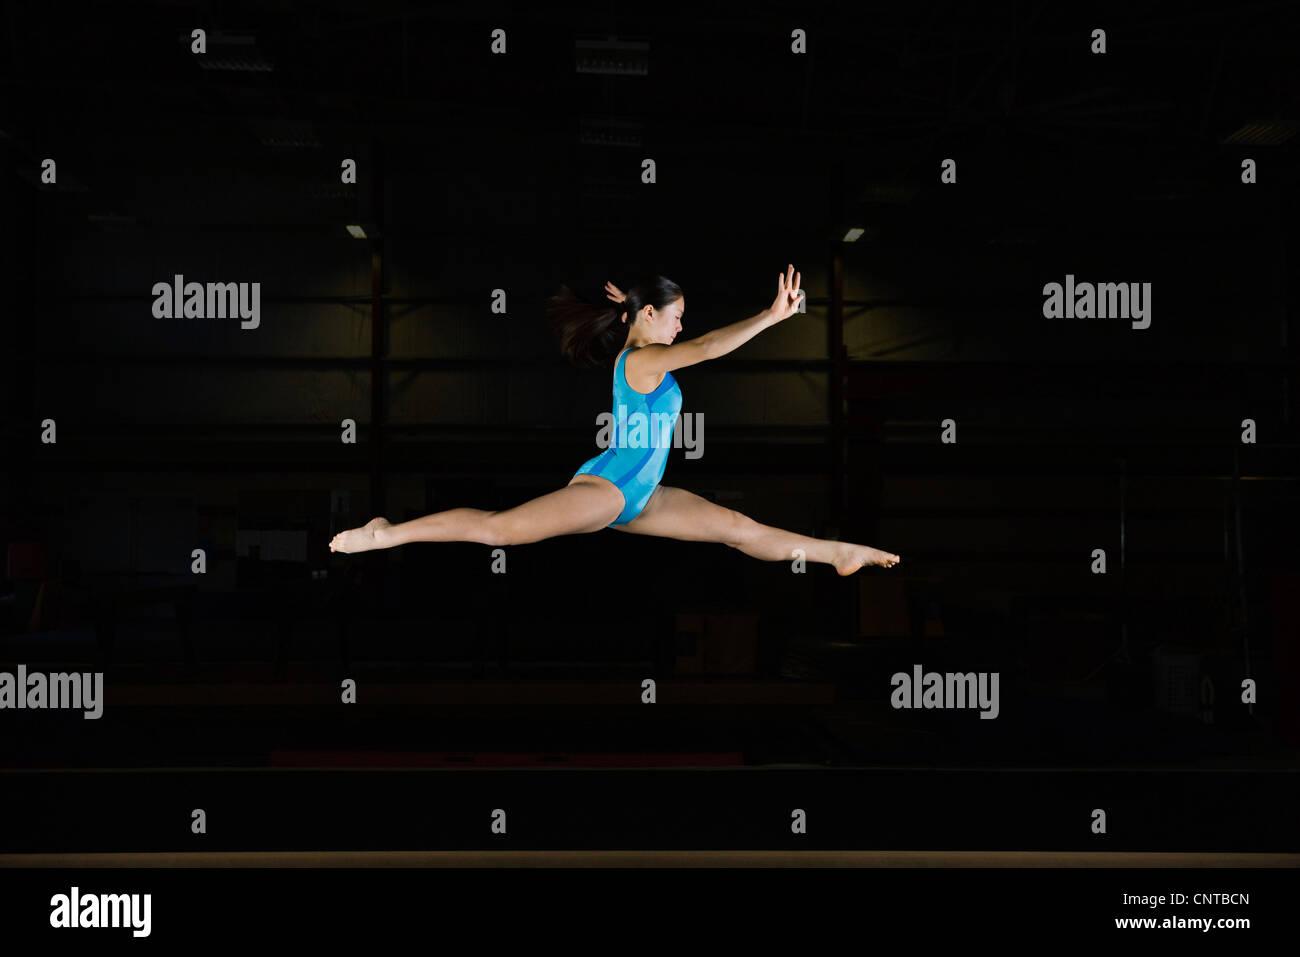 Tenage girl gymnast performing split leap - Stock Image